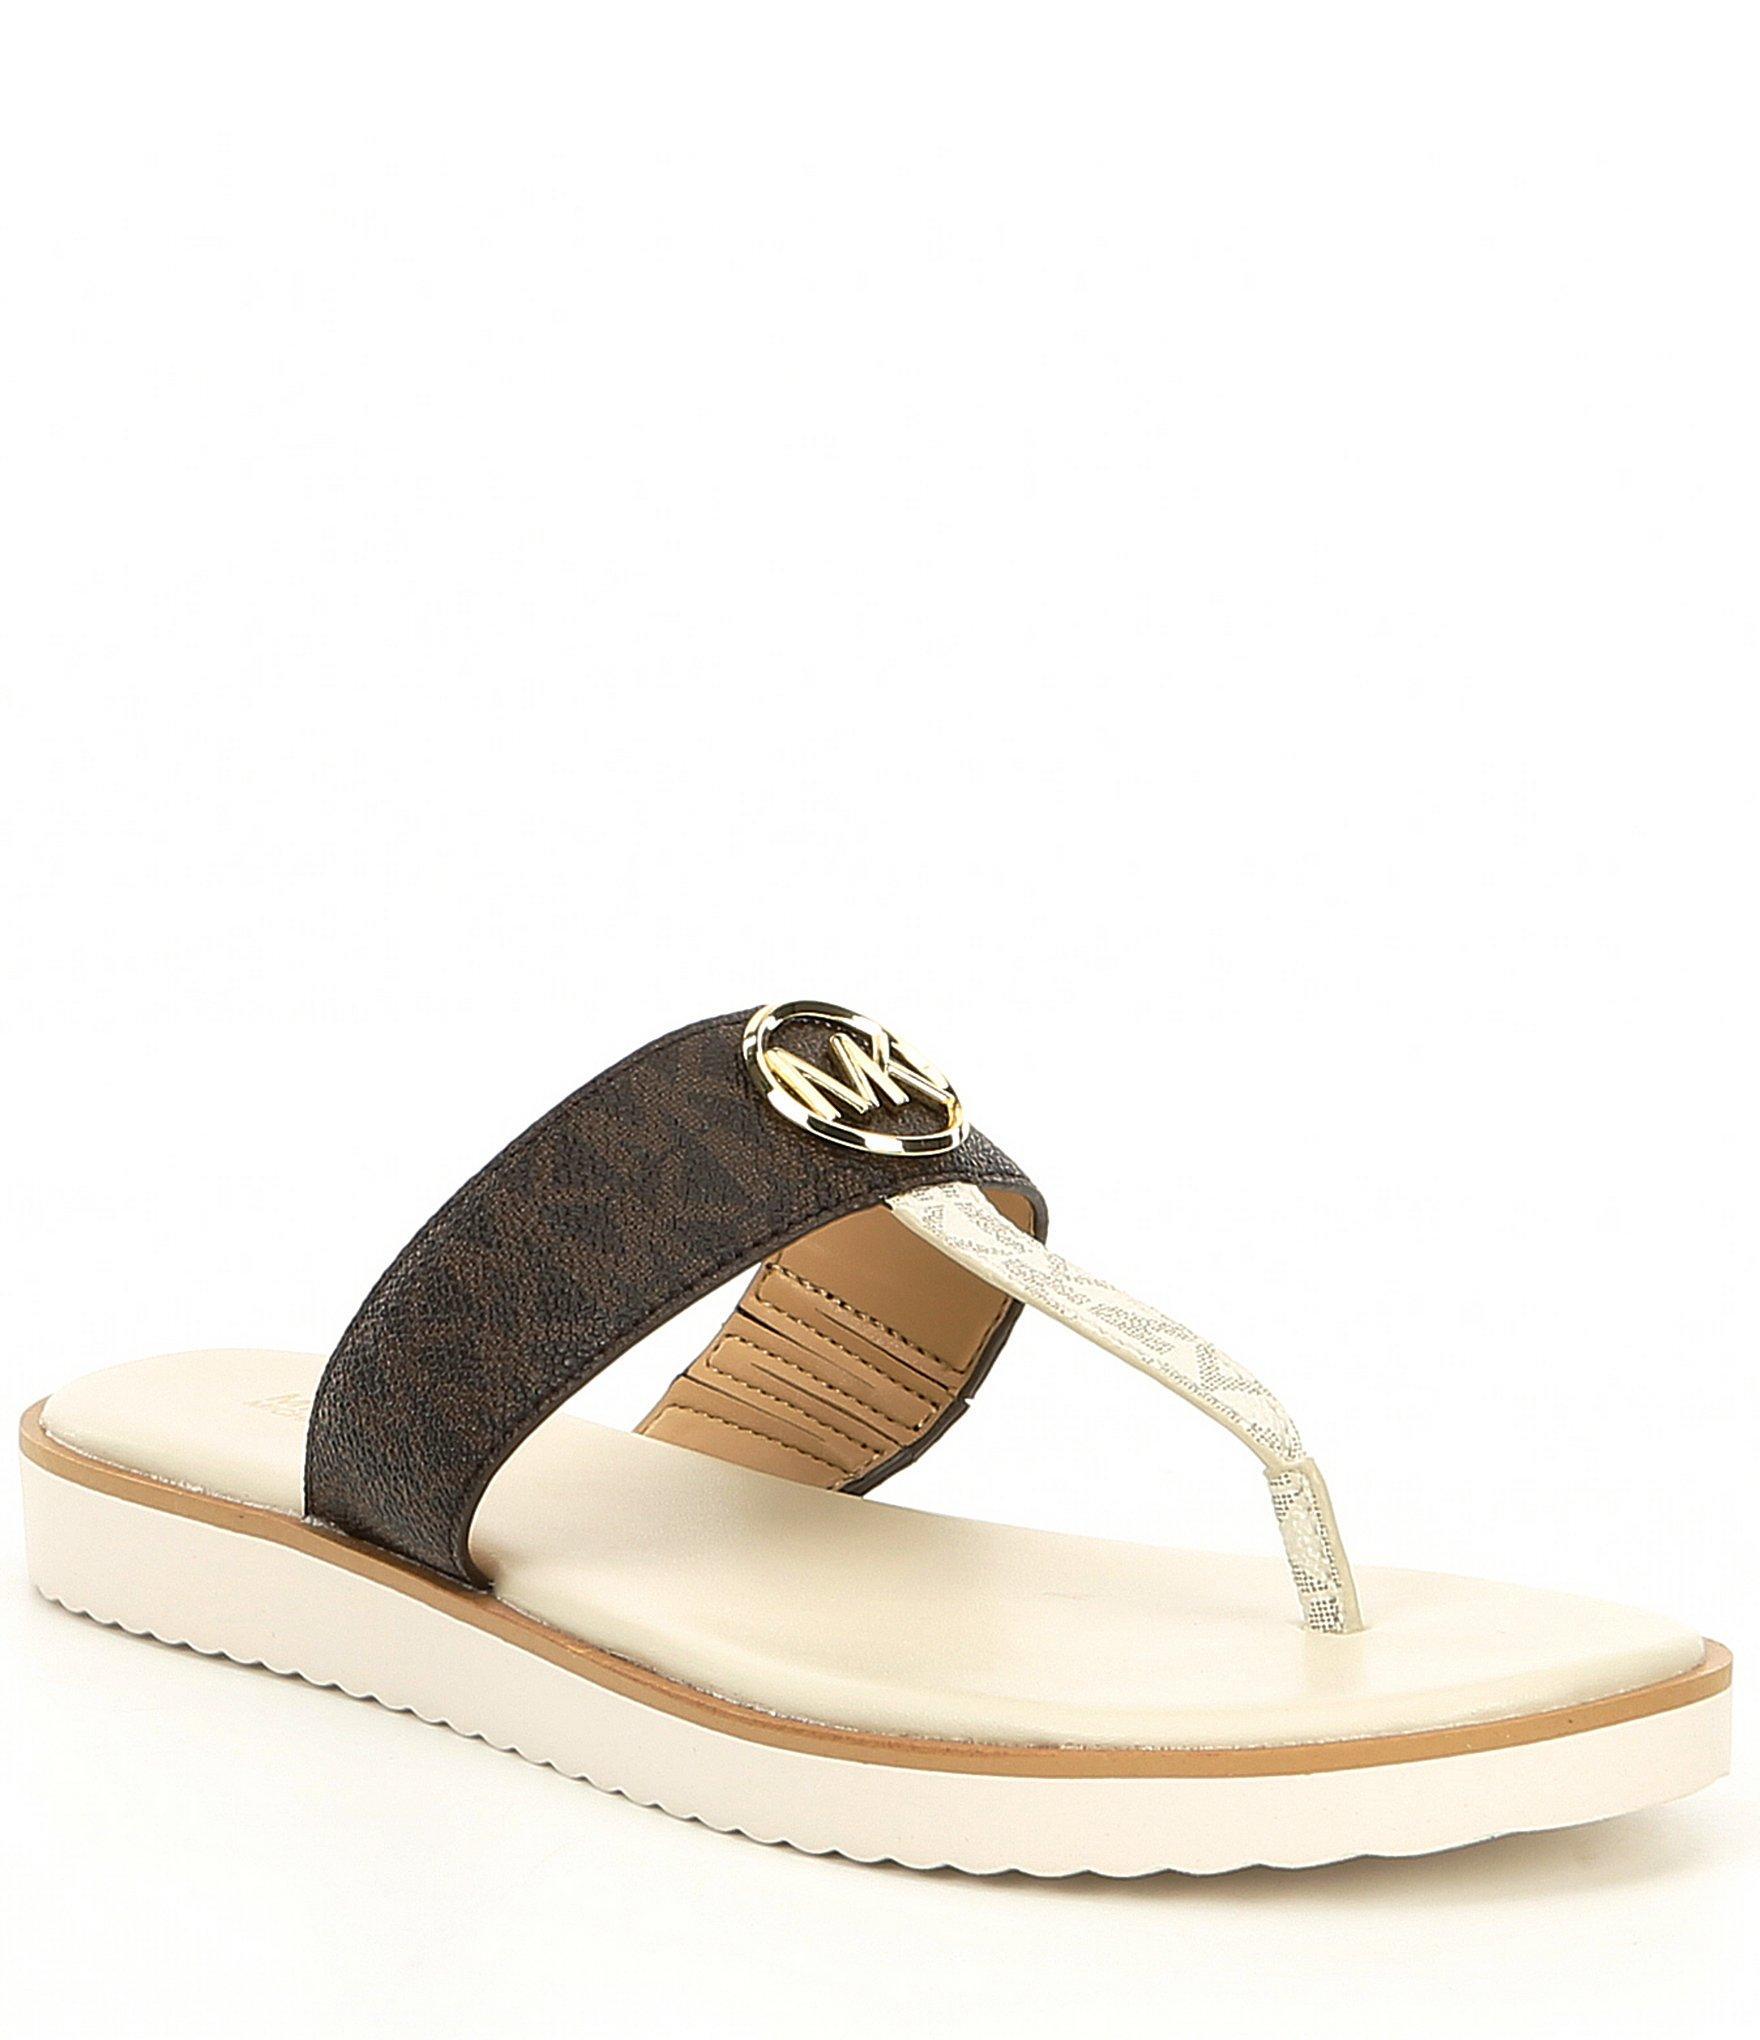 f079c2d2959 Lyst - MICHAEL Michael Kors Lillie Logo Printed Thong Sandals in Brown